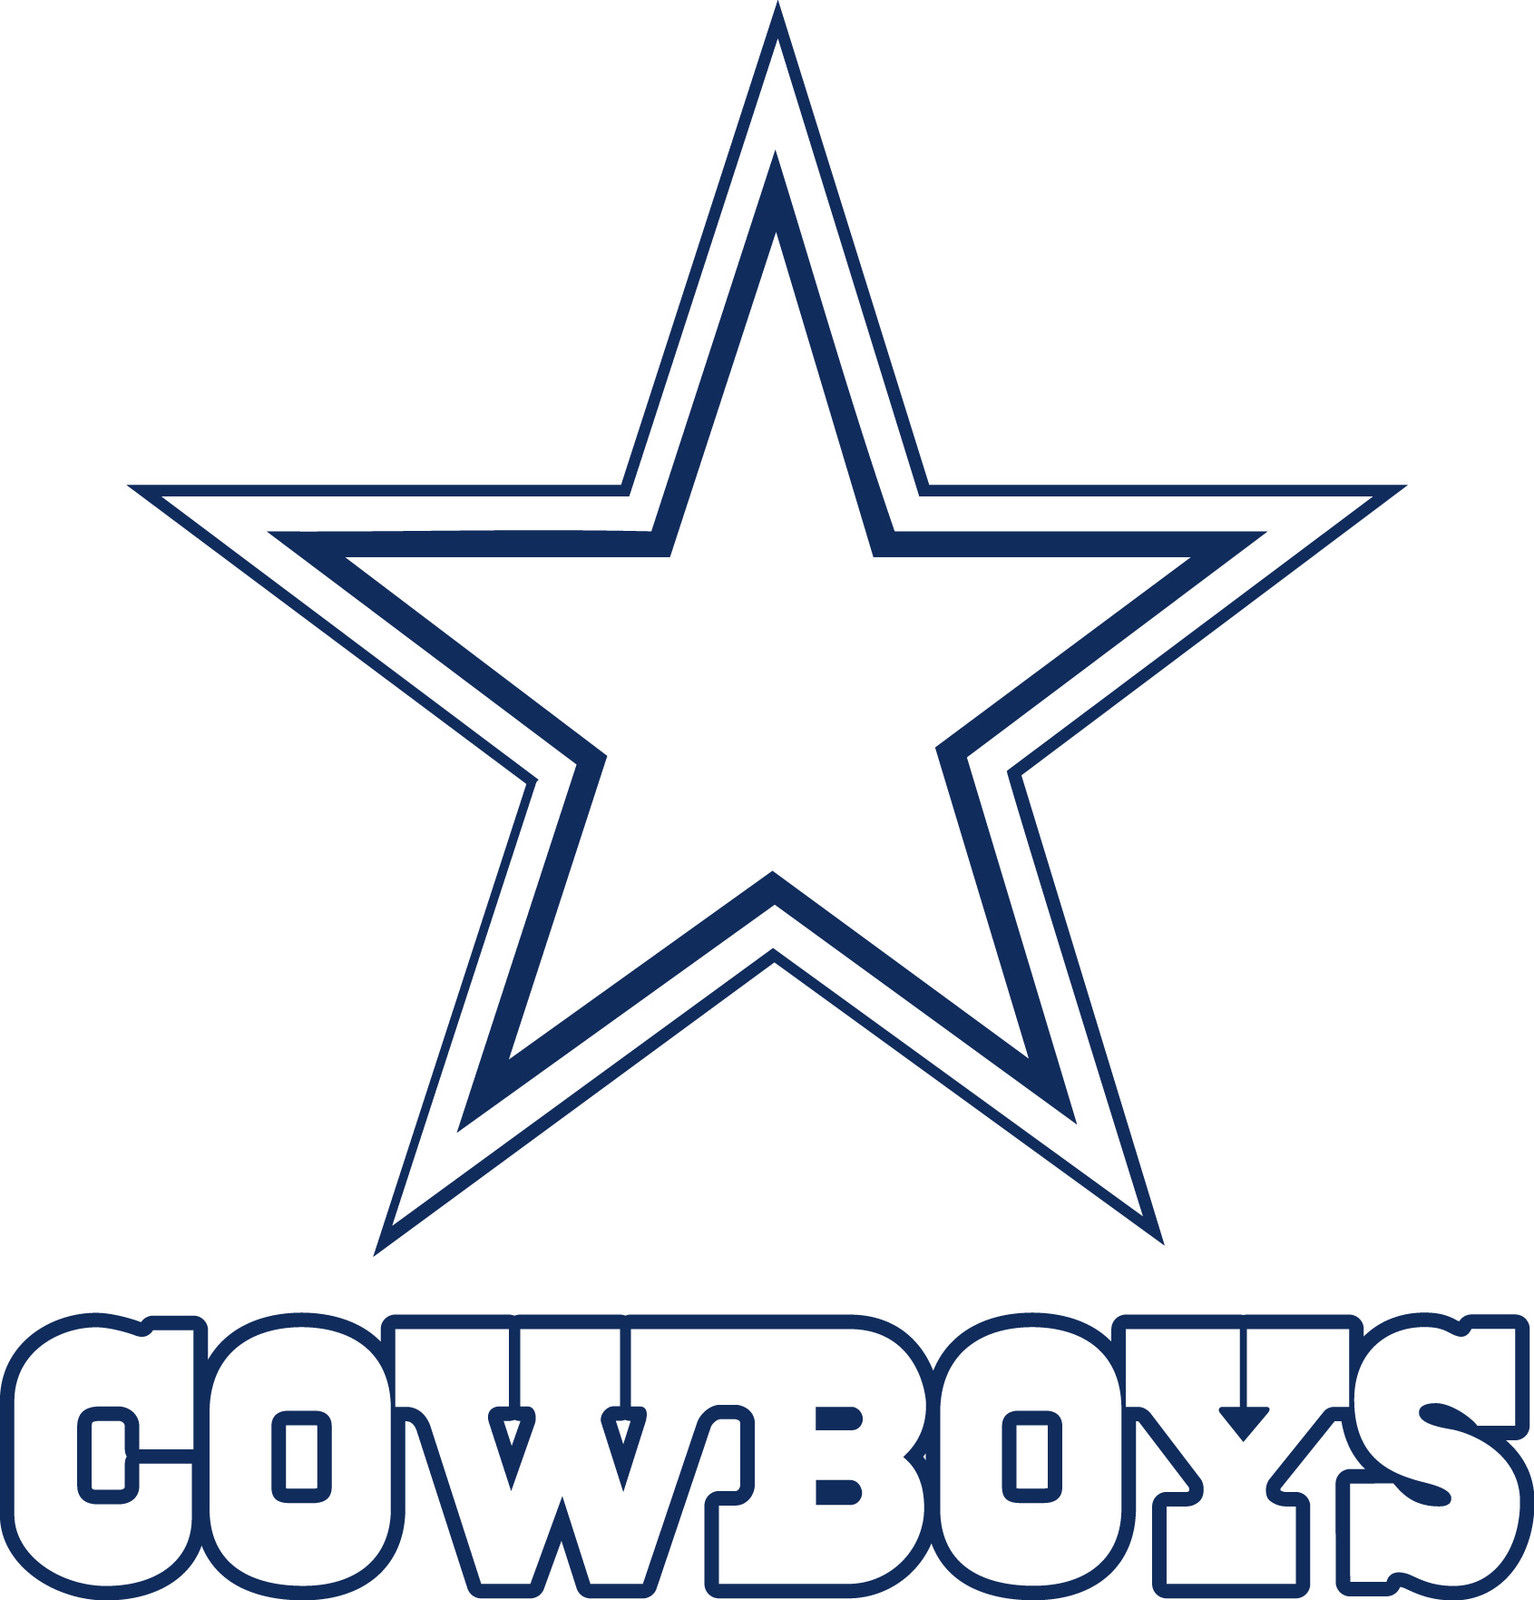 Dallas Cowboys Star Logo Images Pink dallas cowboys star logo 1534x1600